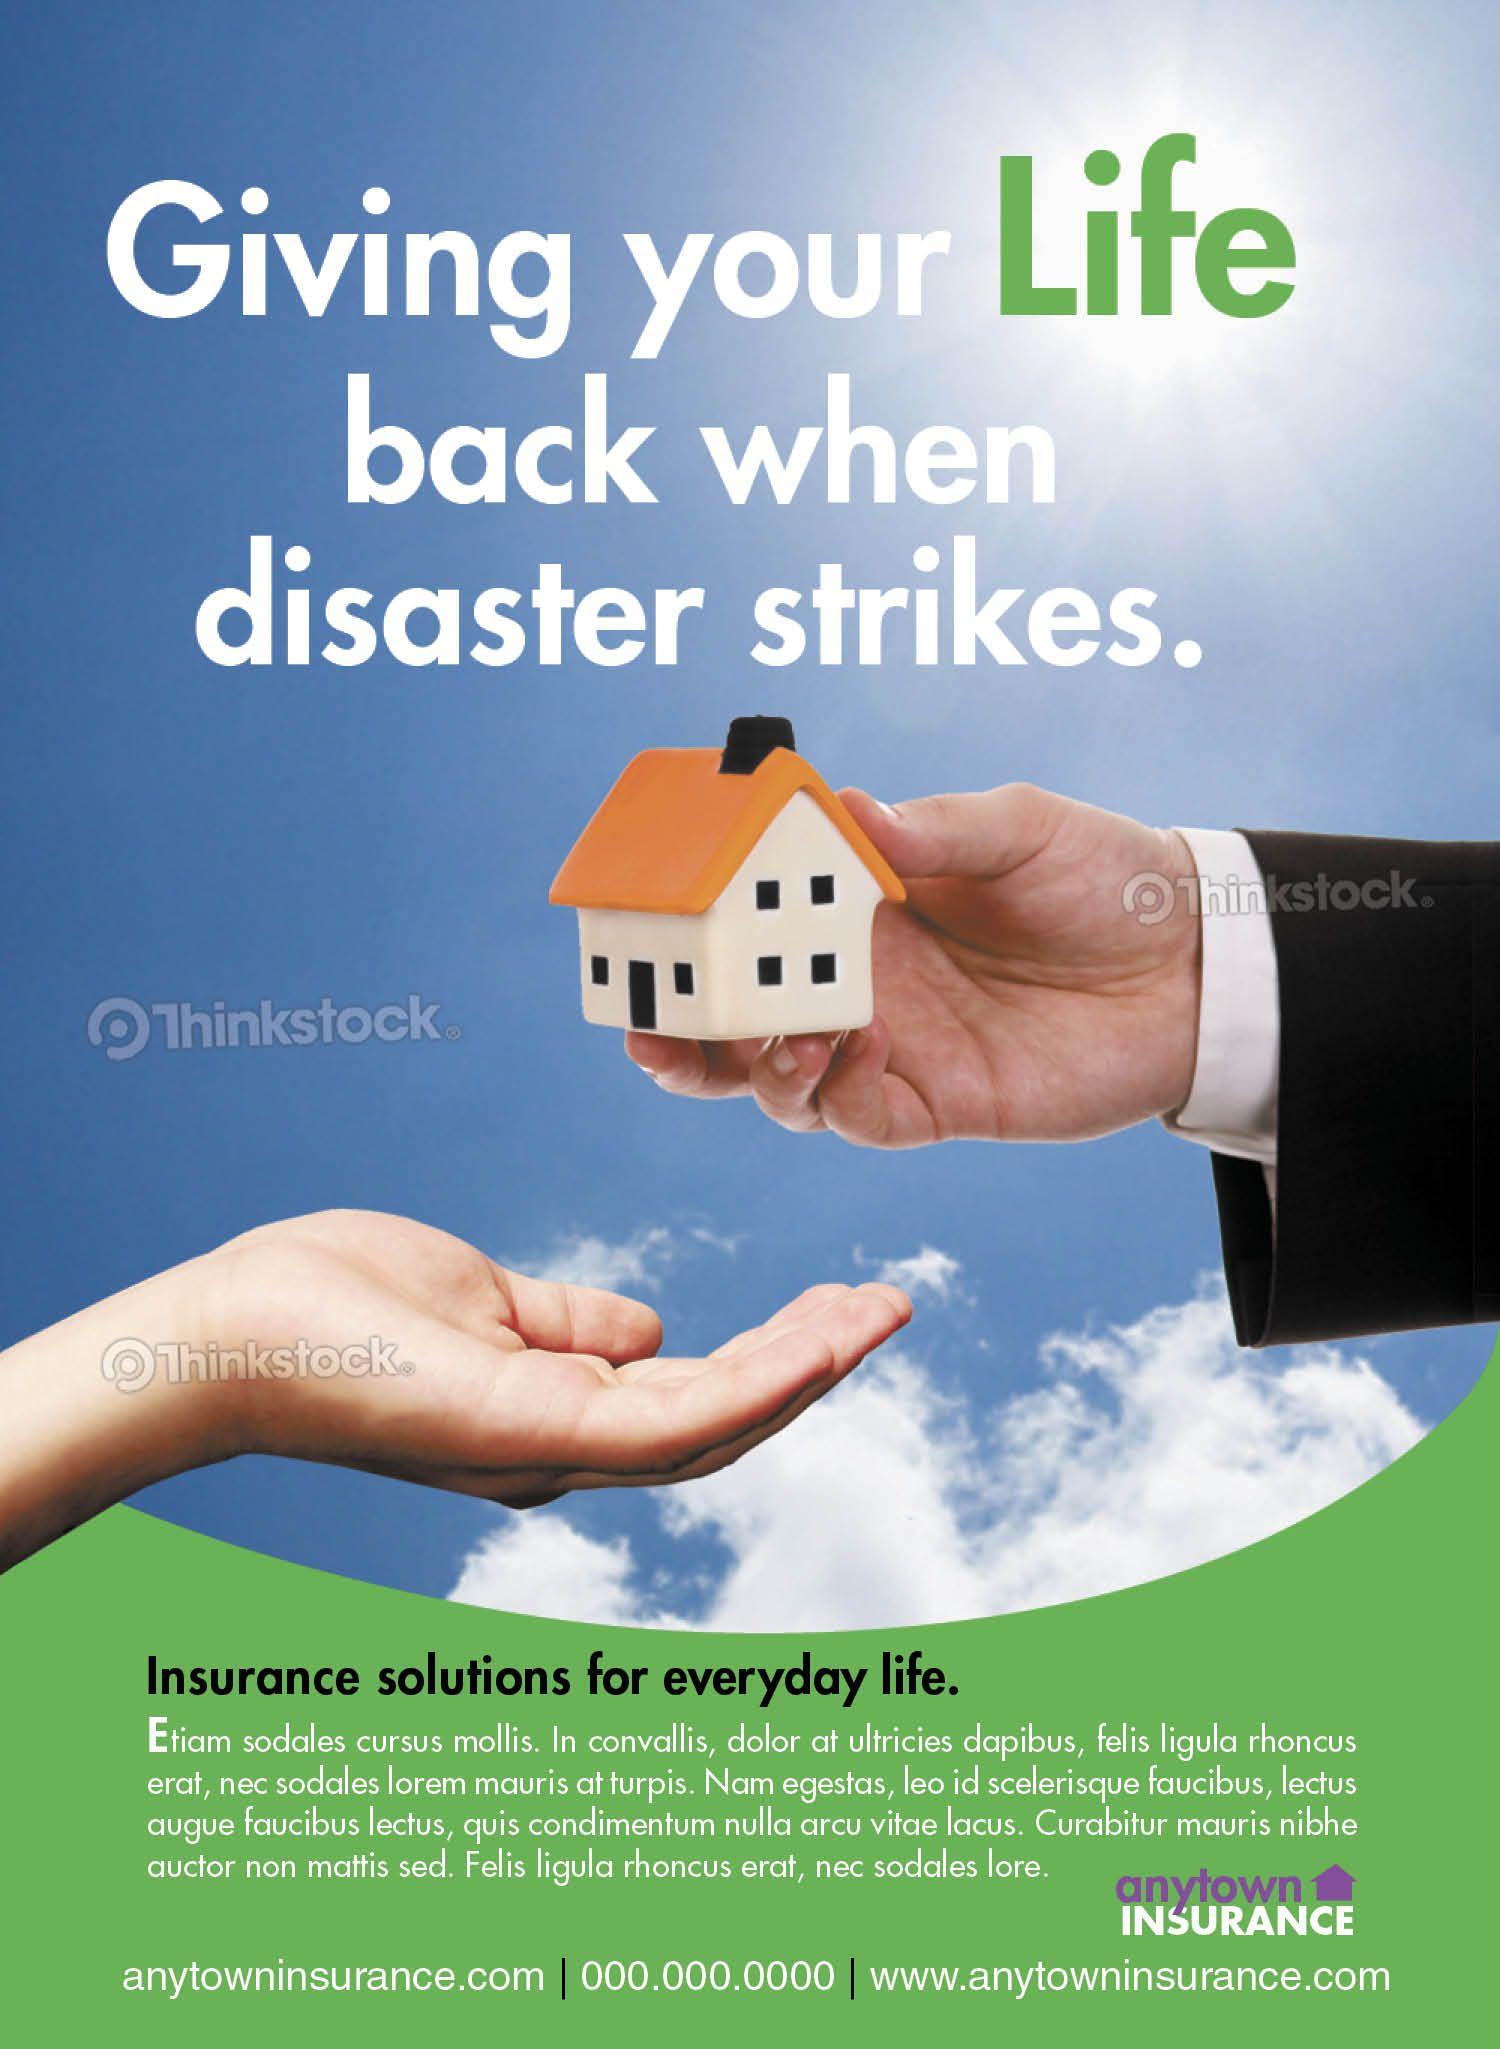 anytown_insurance Insurance ads, Life, Insurance